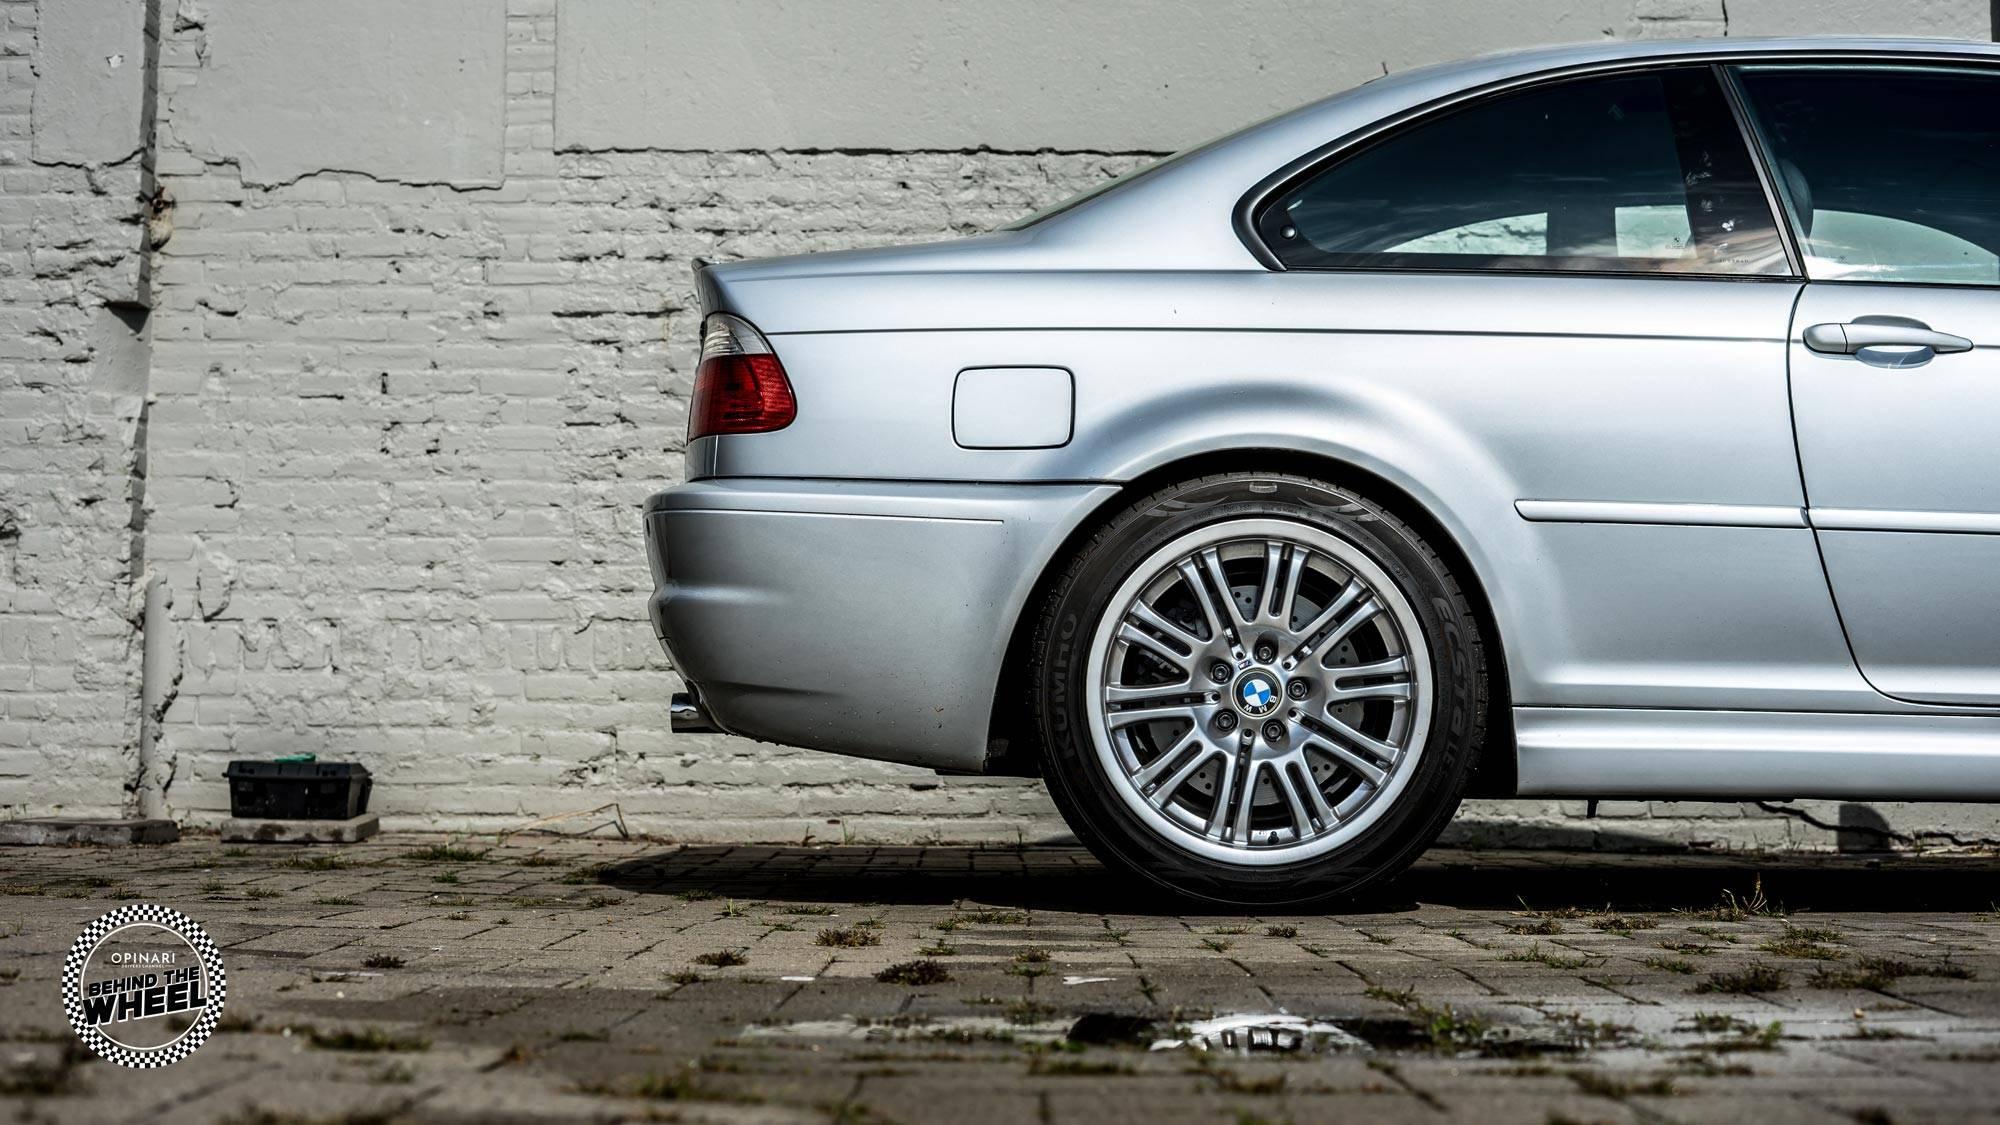 BMW M3 E46 rims